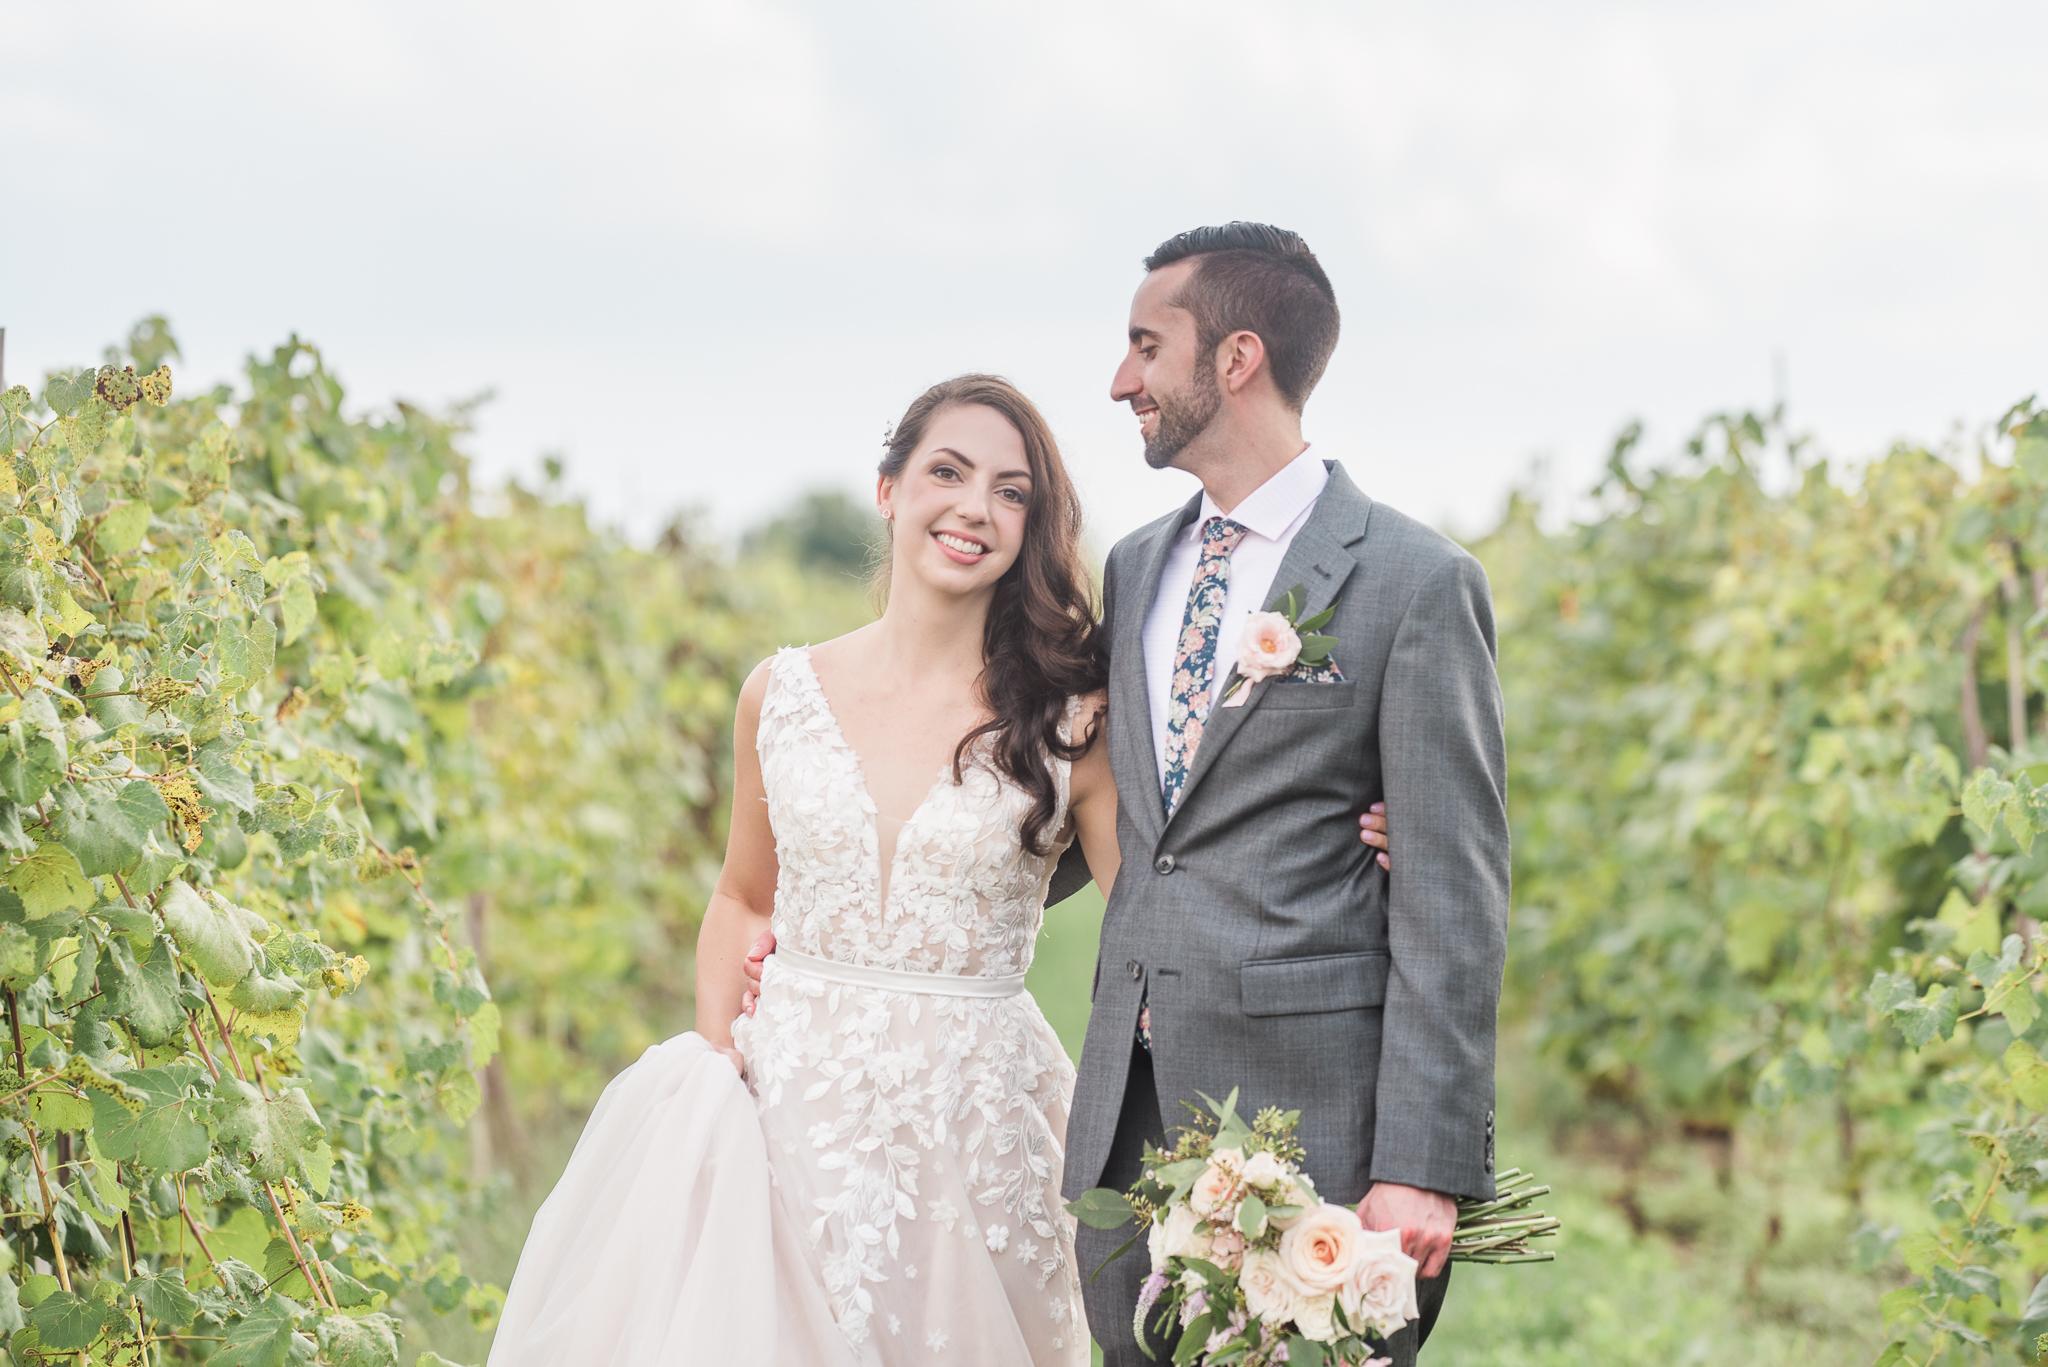 Sycamore at Mallow Run Wedding7142.jpg